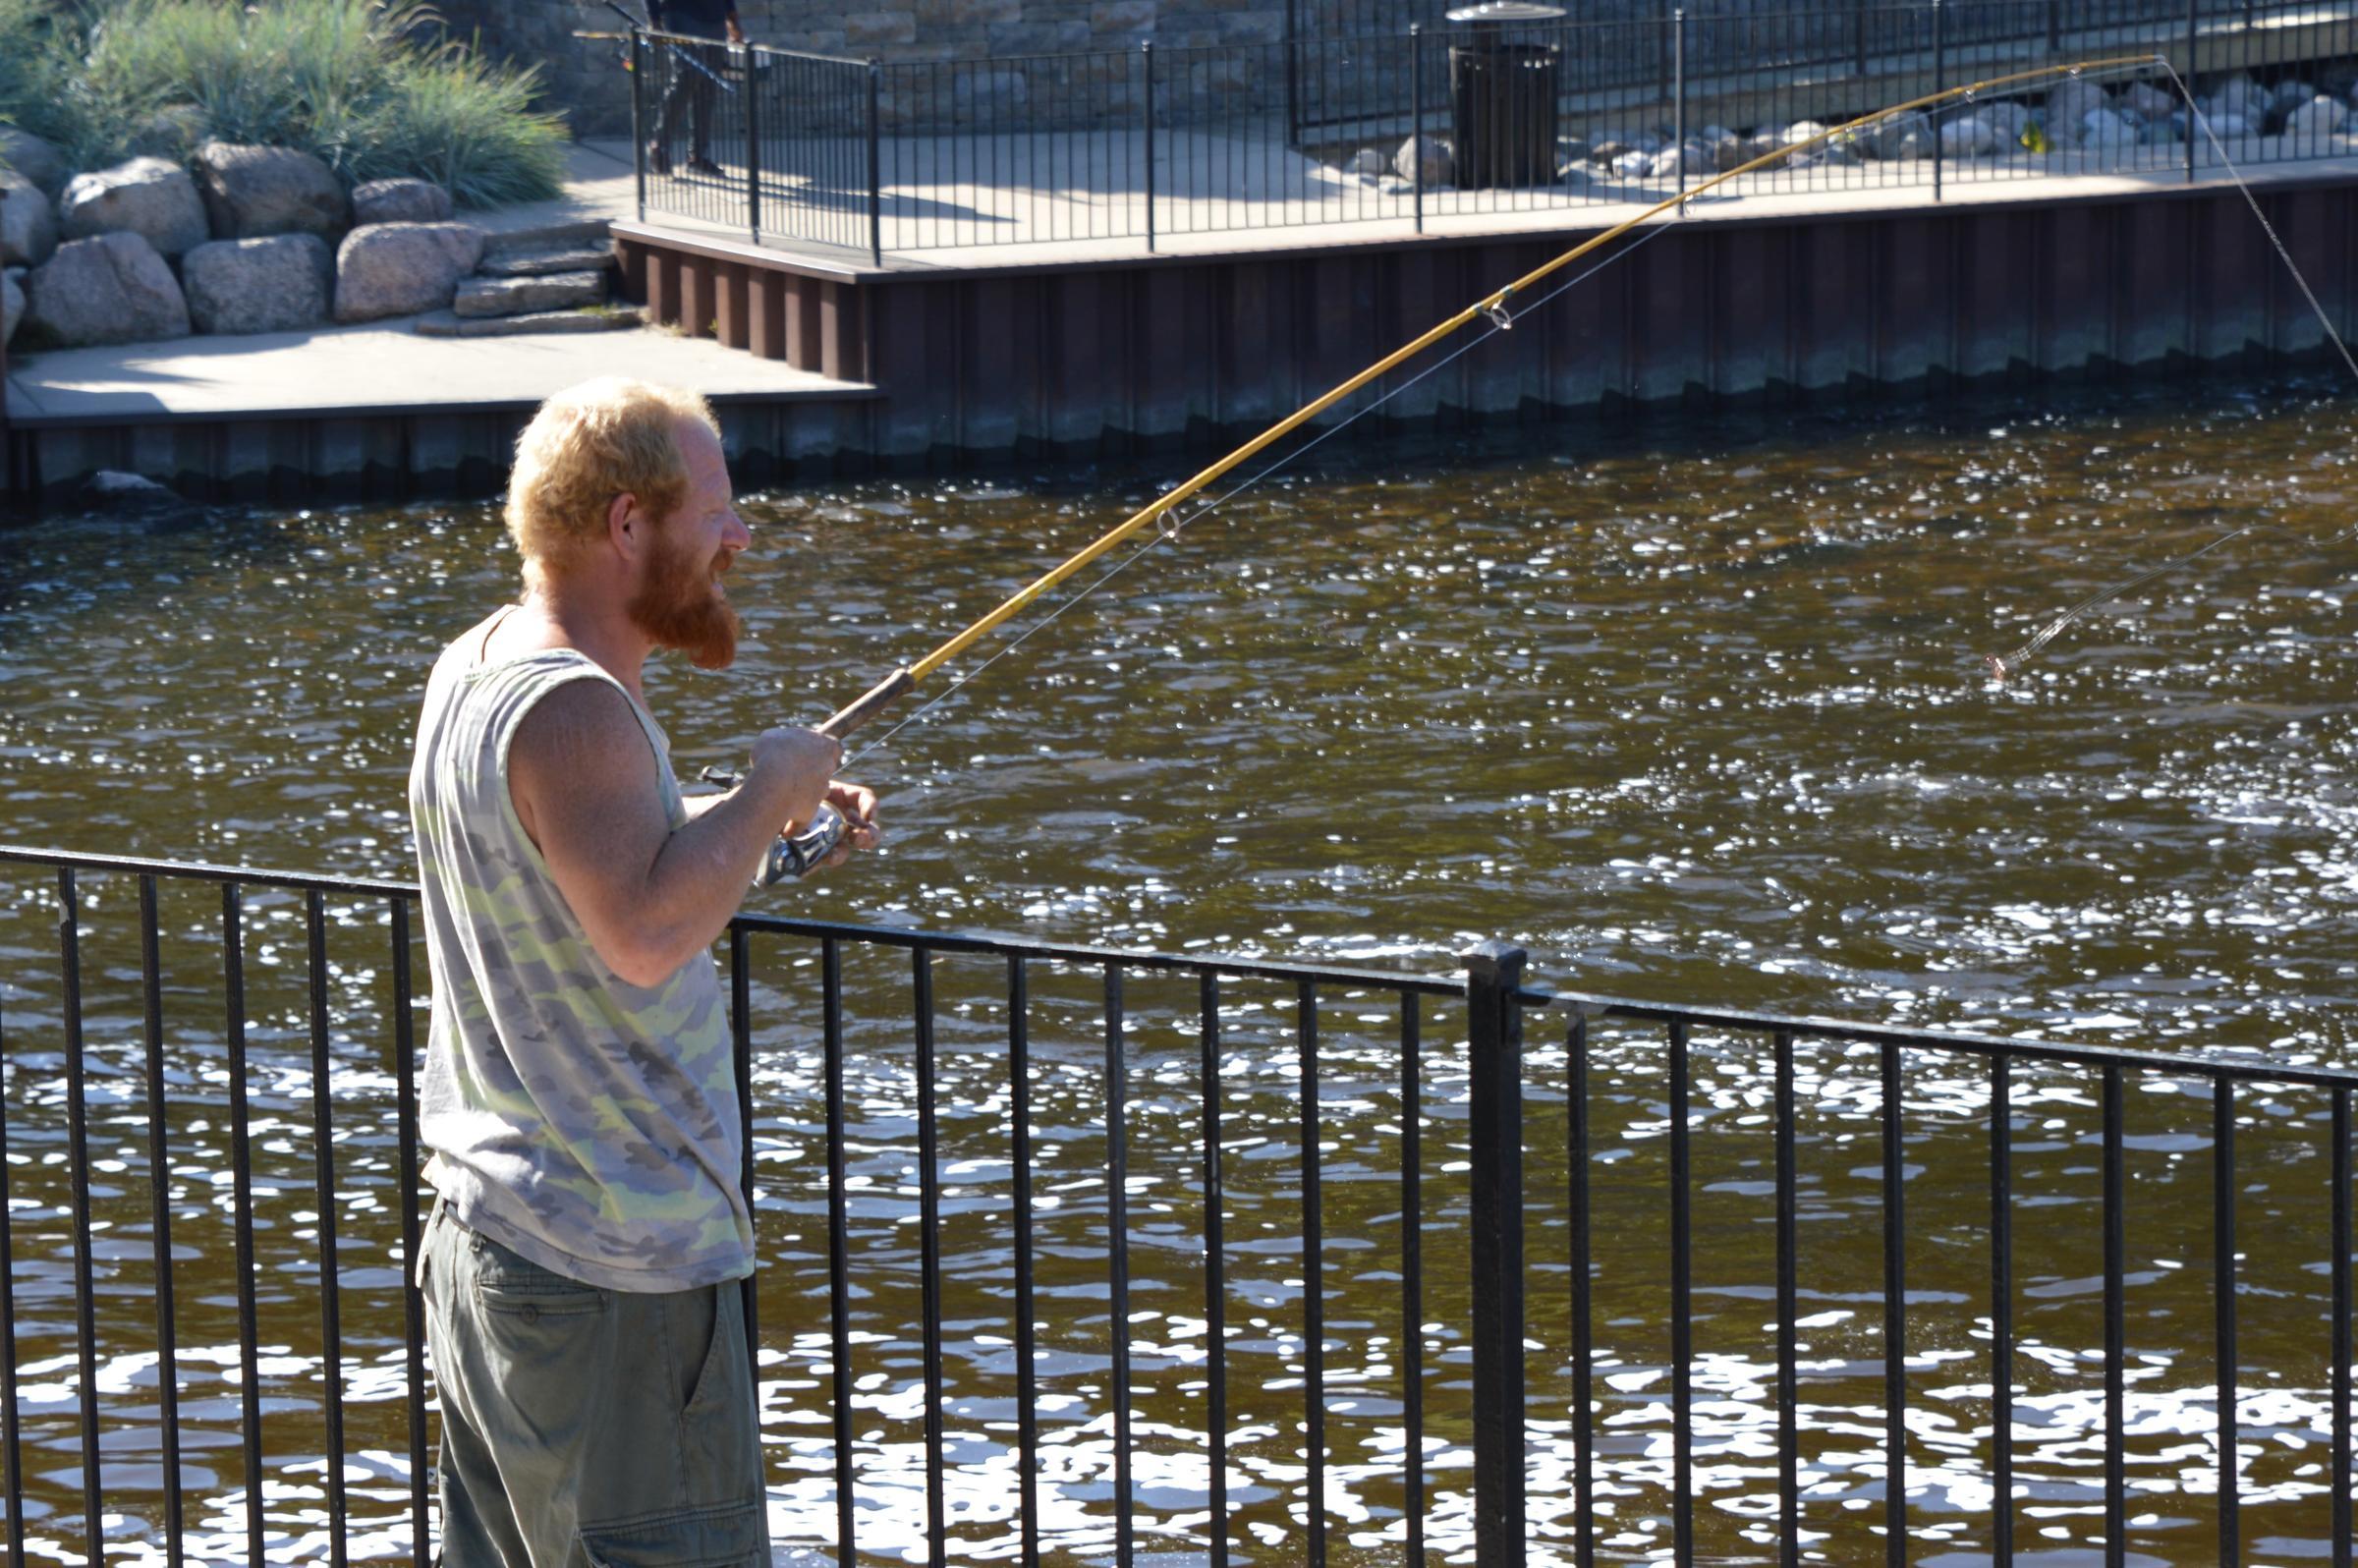 PFAS causes 'Do not eat the fish' advisories | Michigan Radio